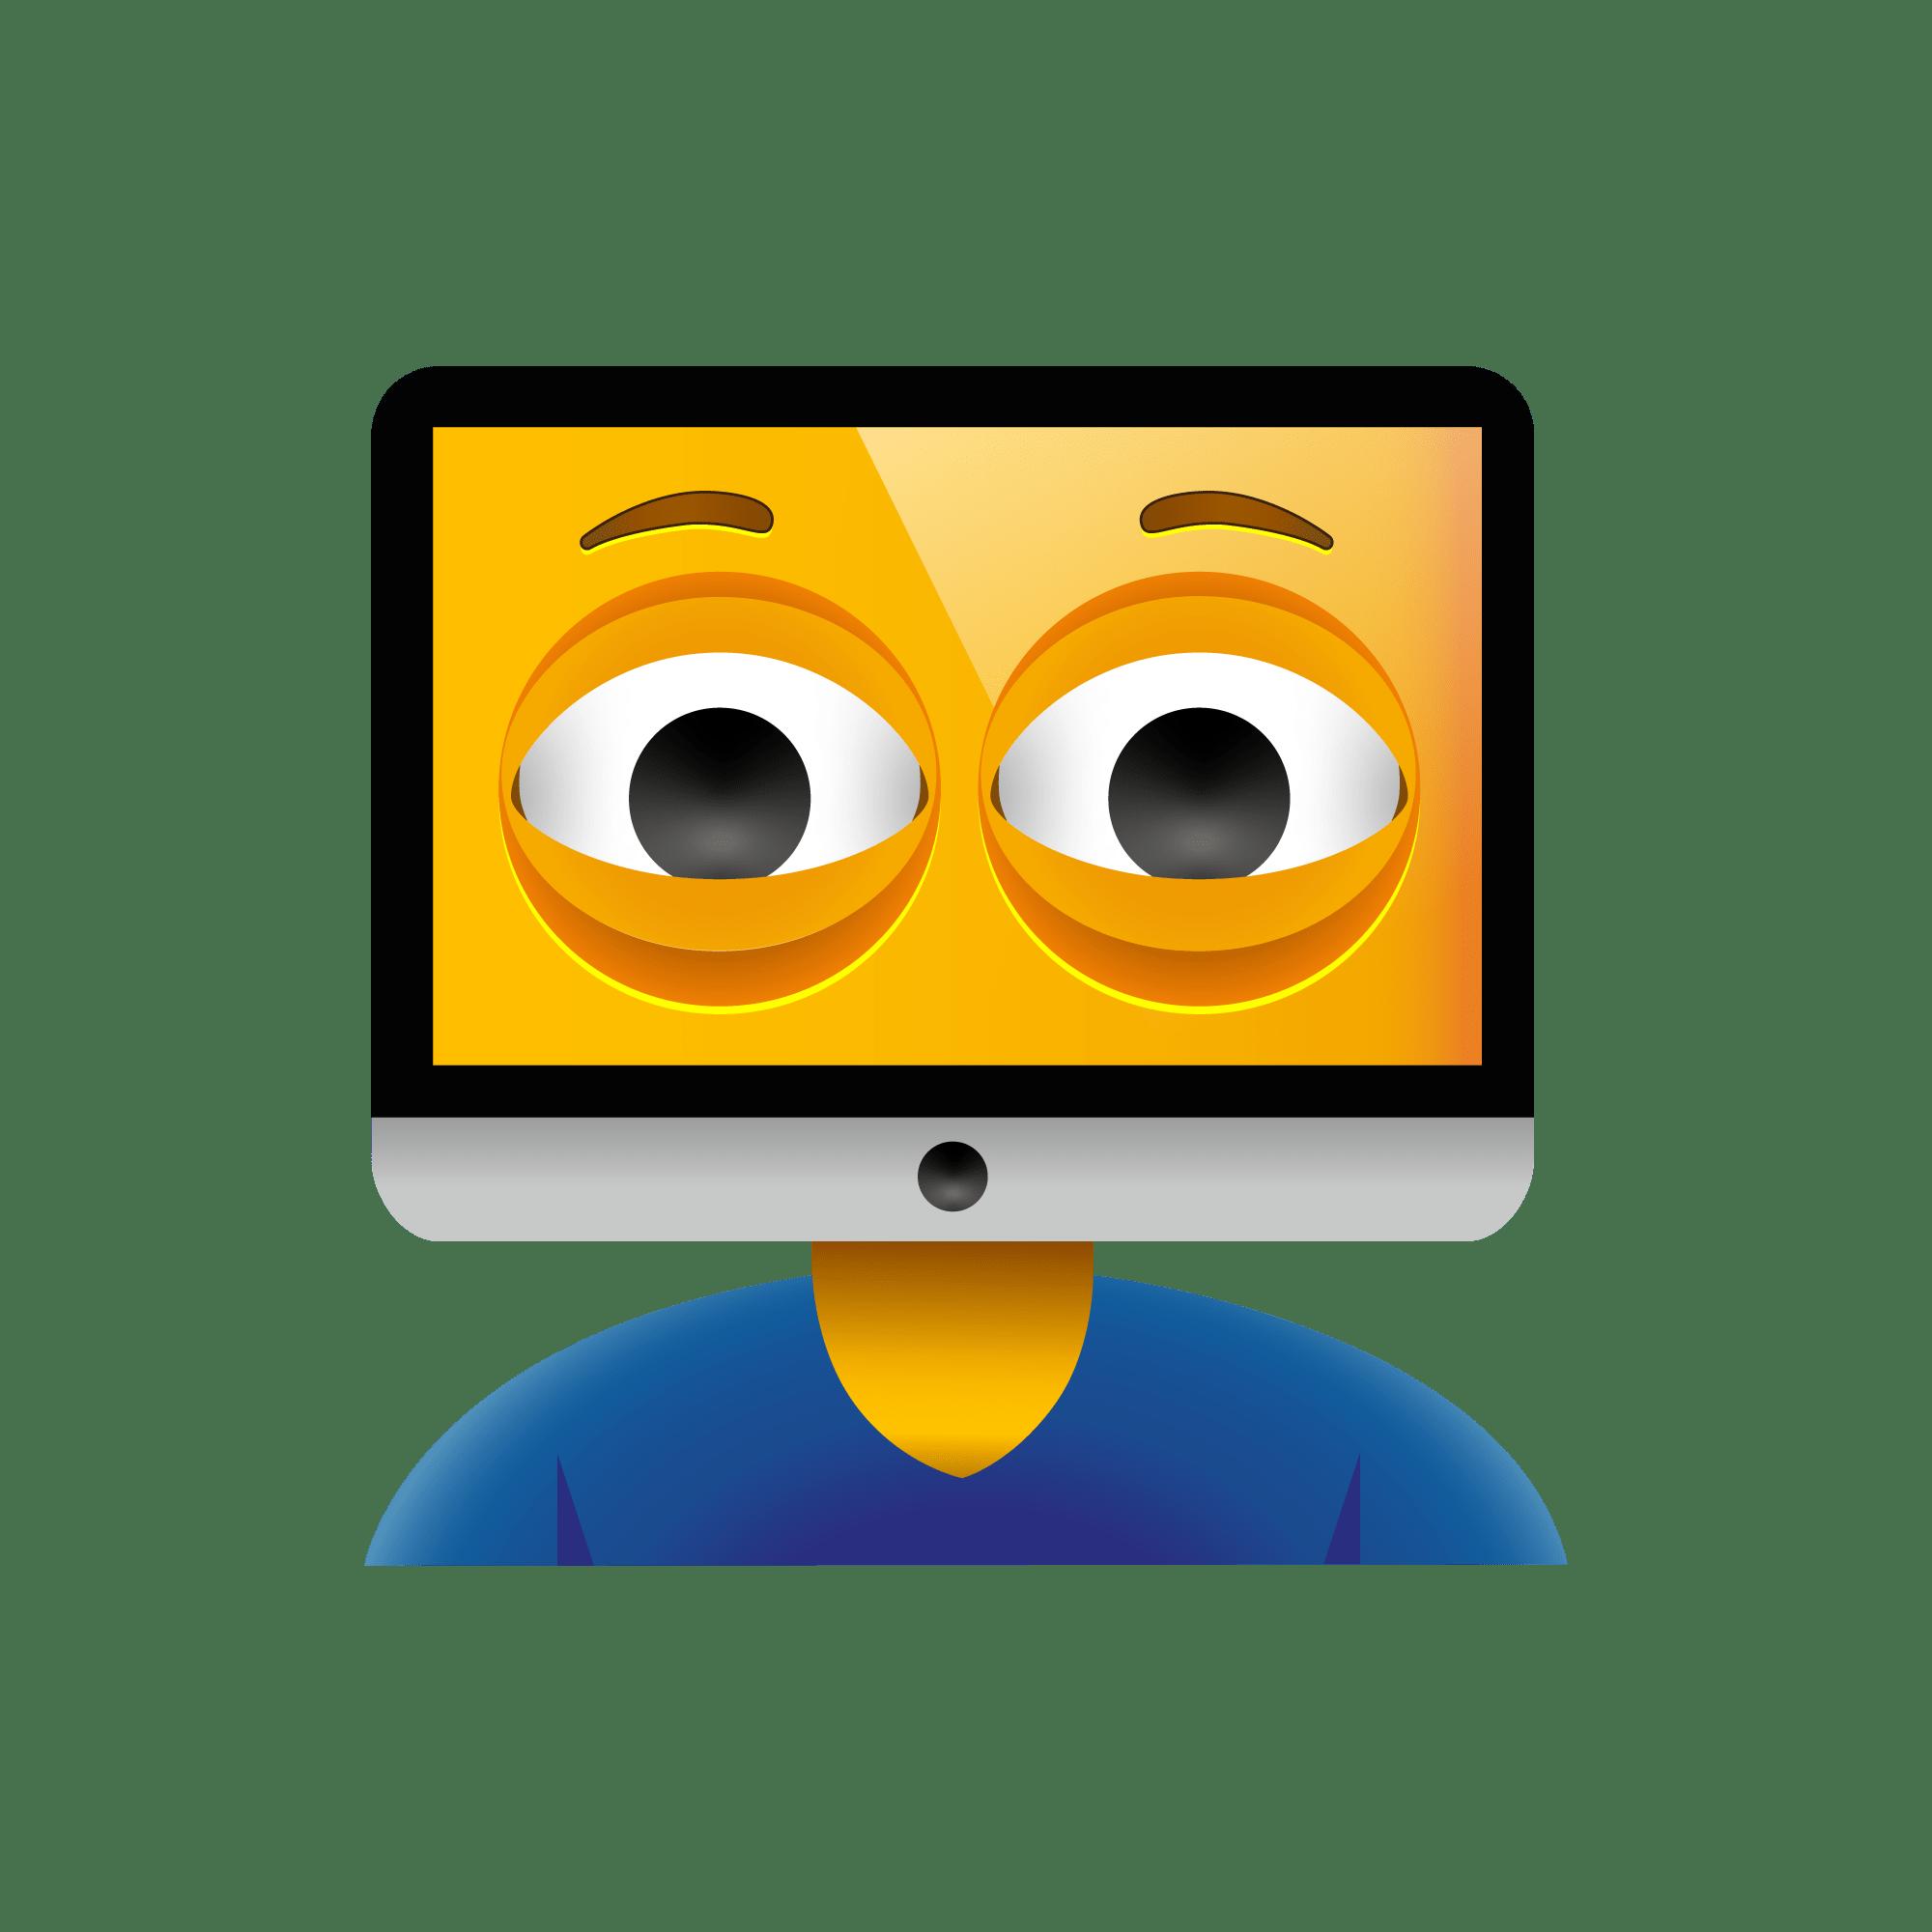 An emoji of a man whose head is a computer.